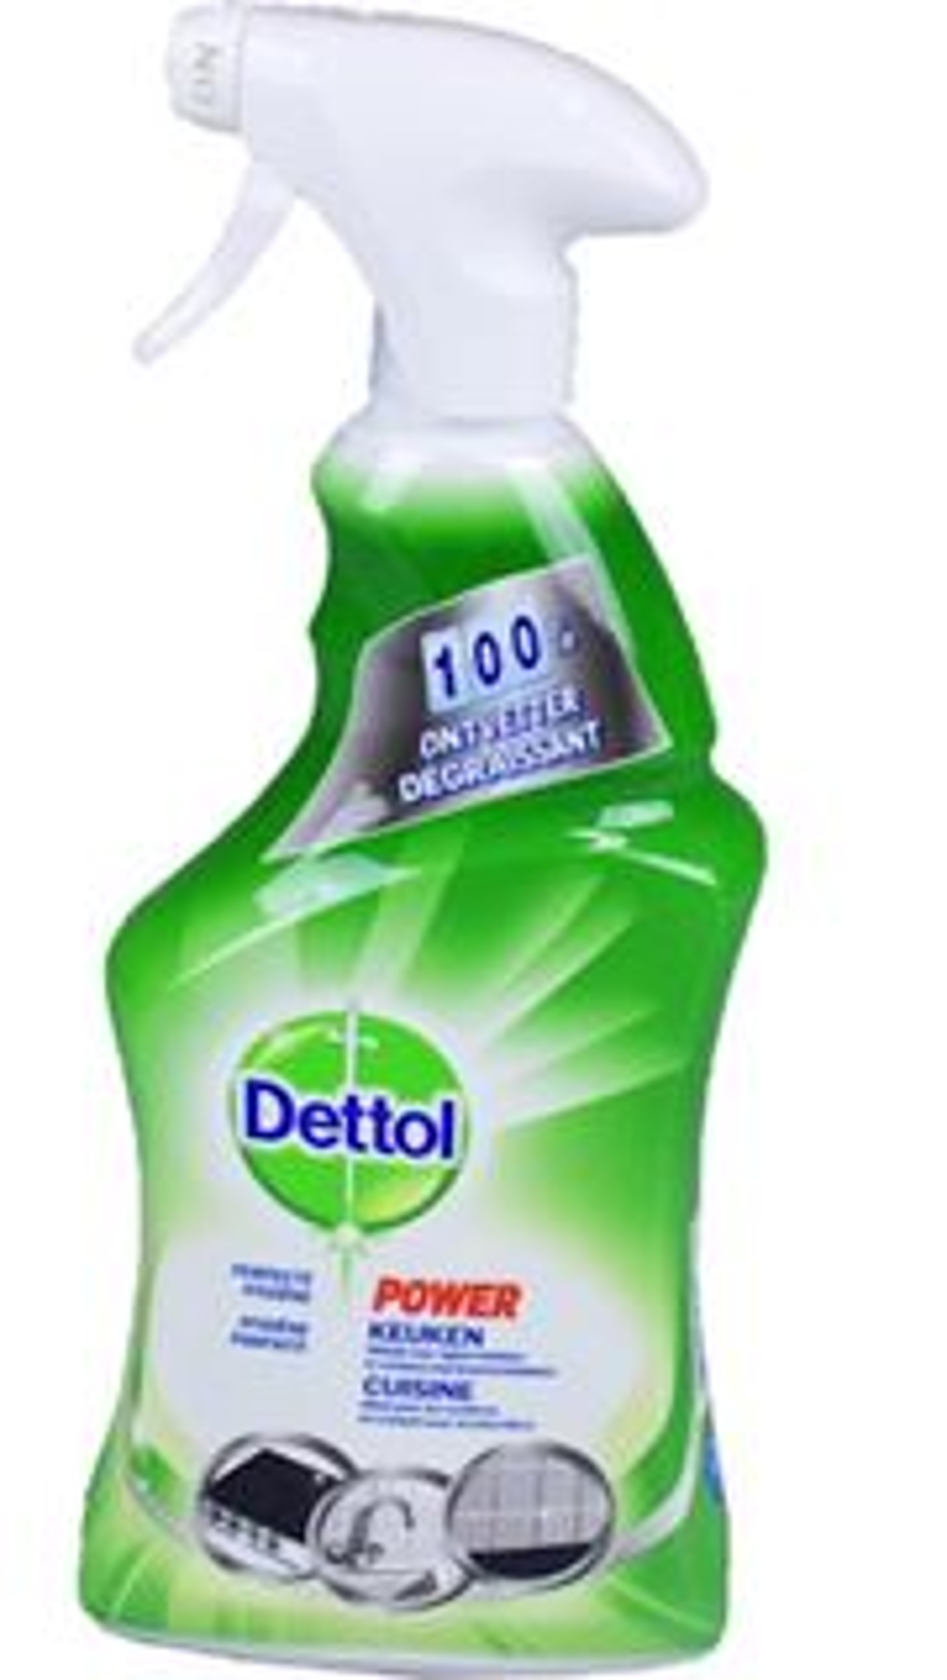 Dettol-spray-750ml-power-pure-keuken